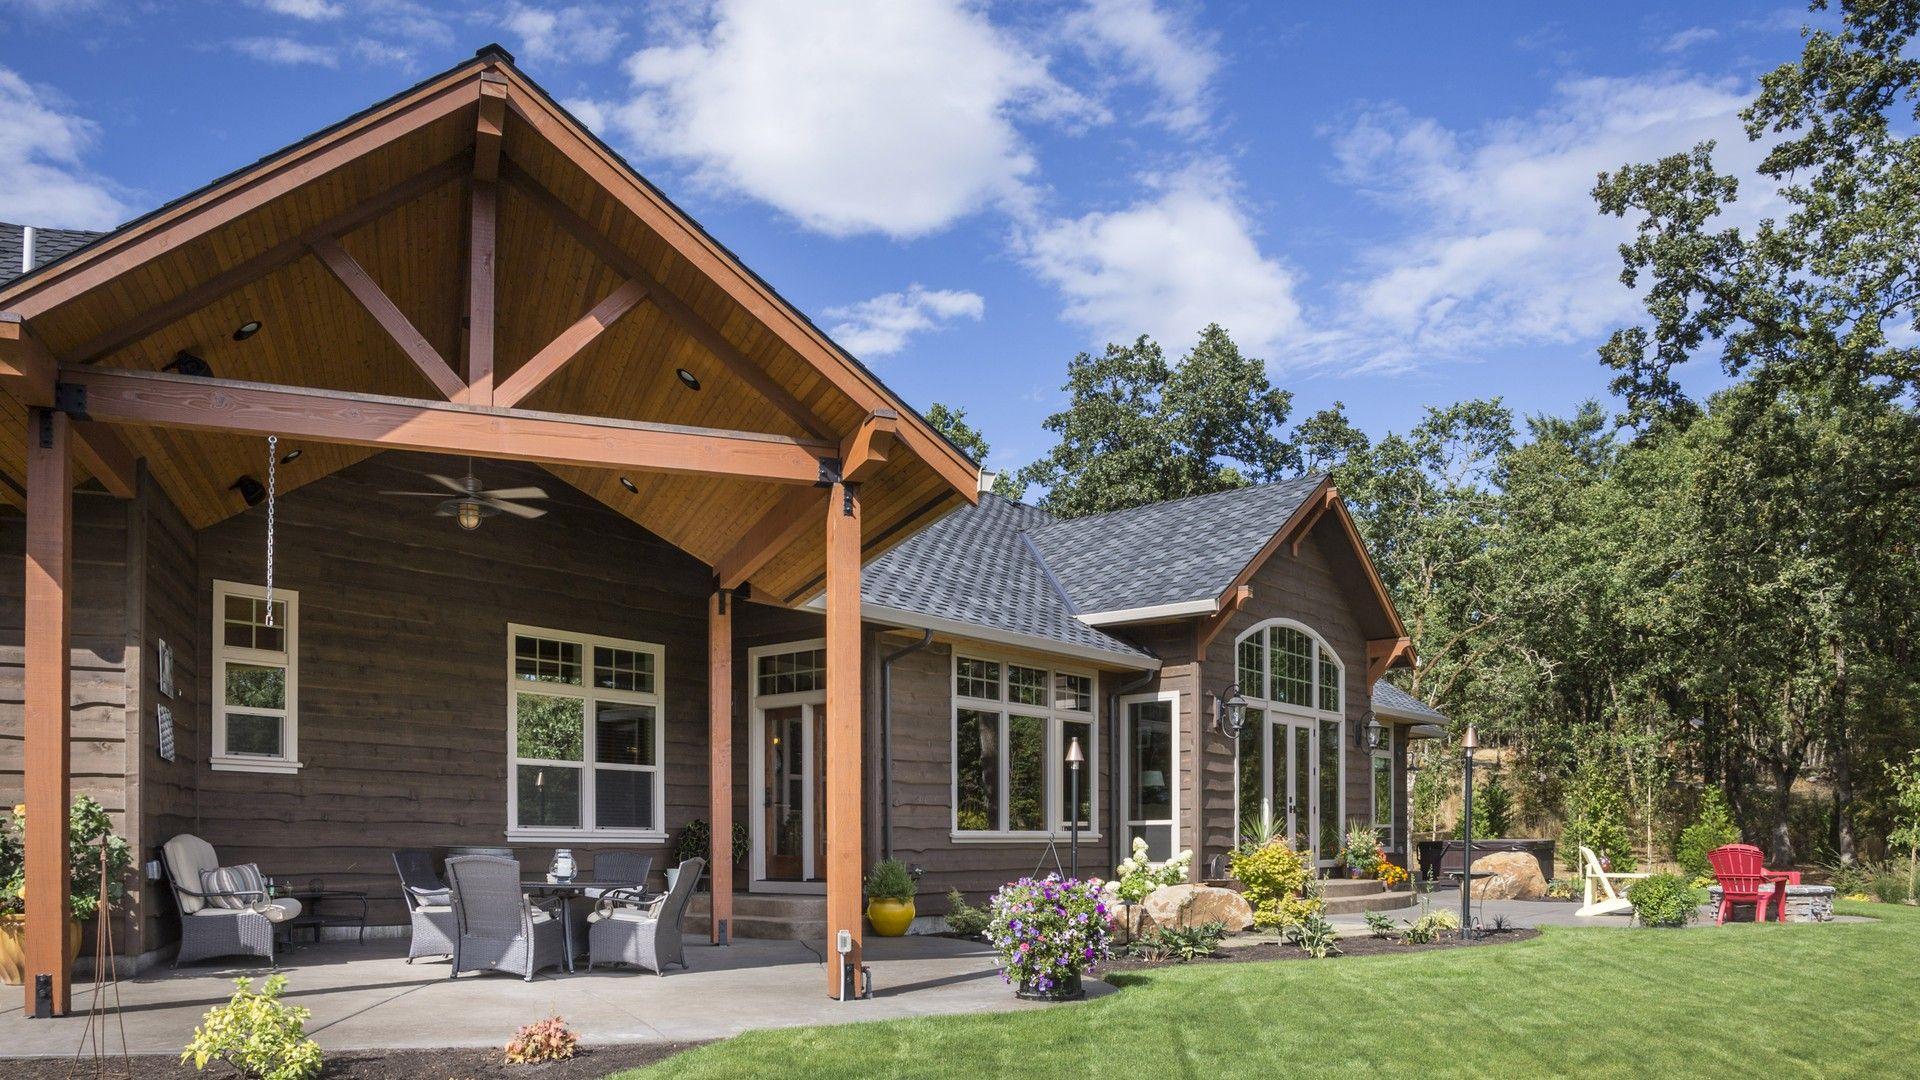 10 Most Inspiring Metal Building Homes Ranch House Plans Ranch Style House Plans Ranch Style Homes